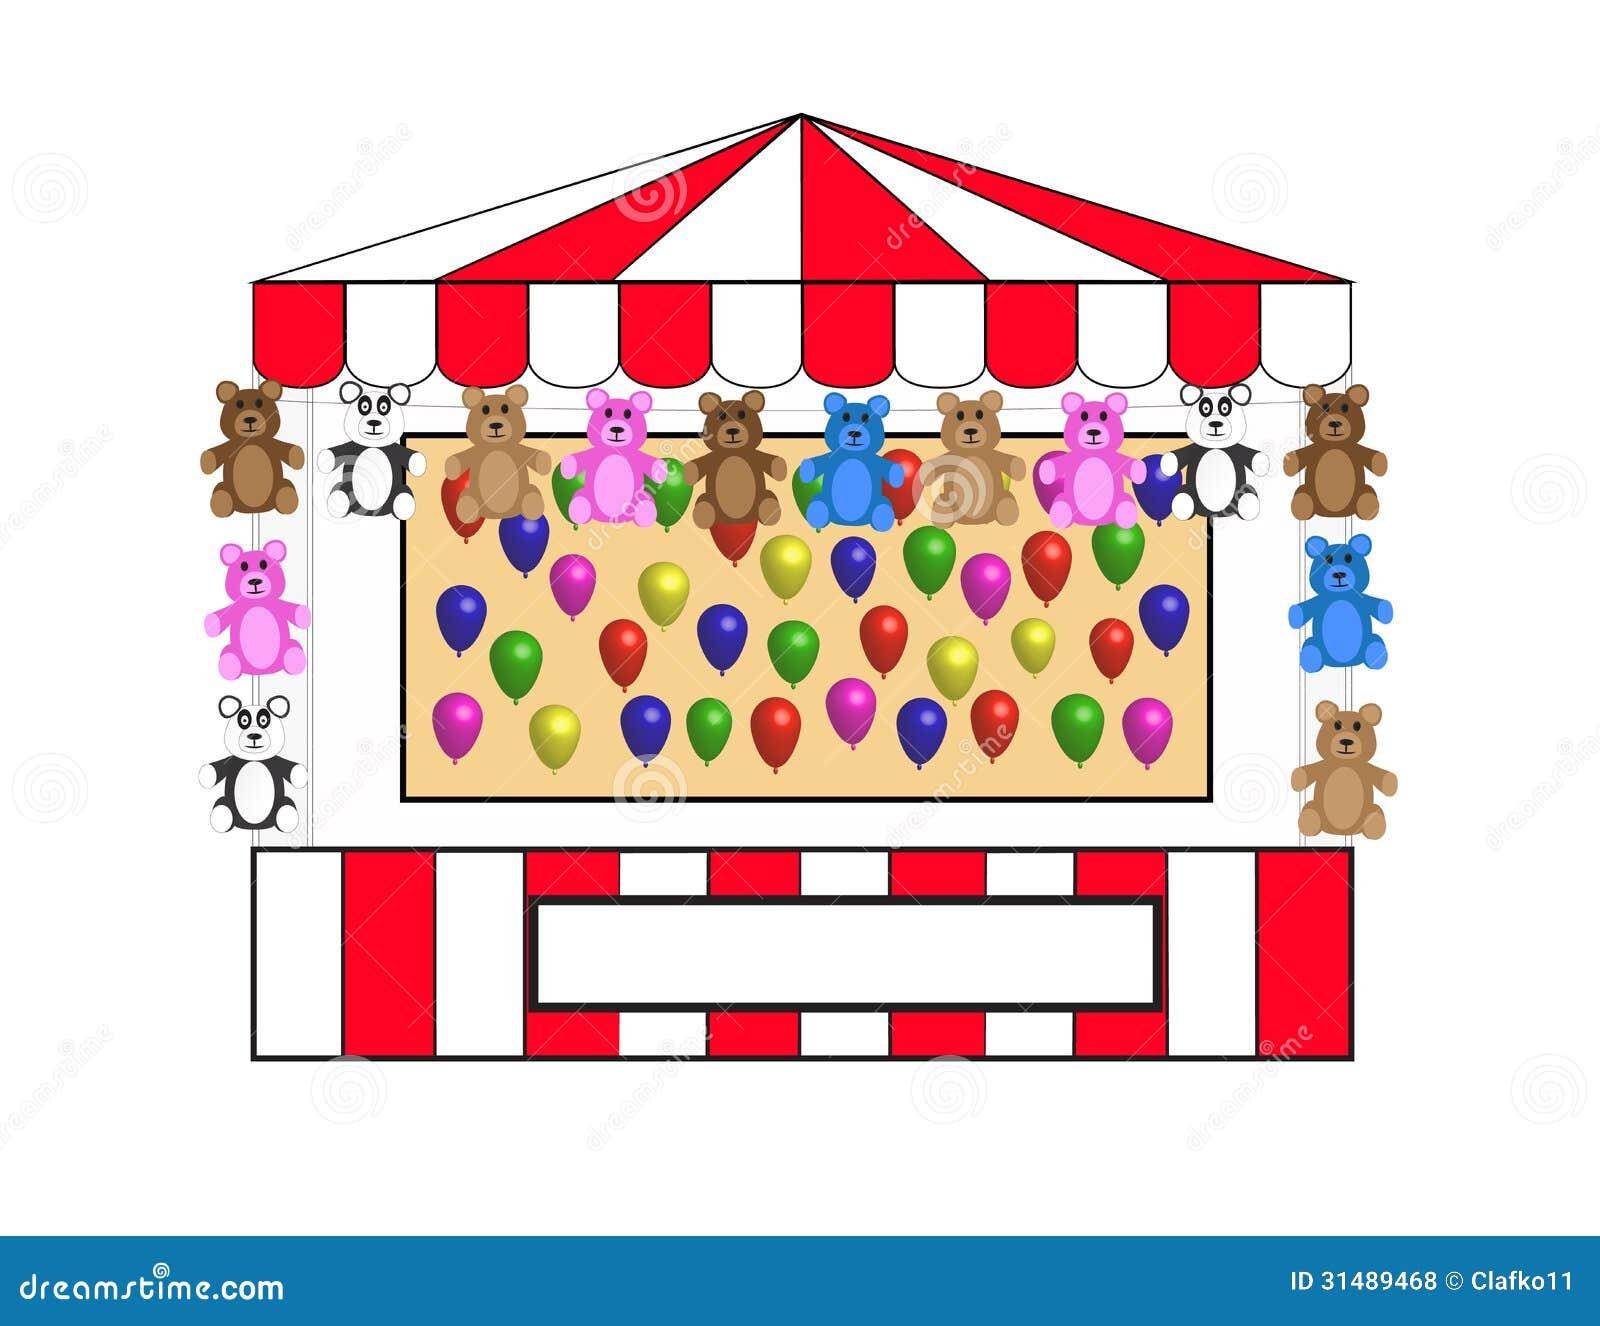 Balloon toss w bears royalty free stock photos image for Free balloon games